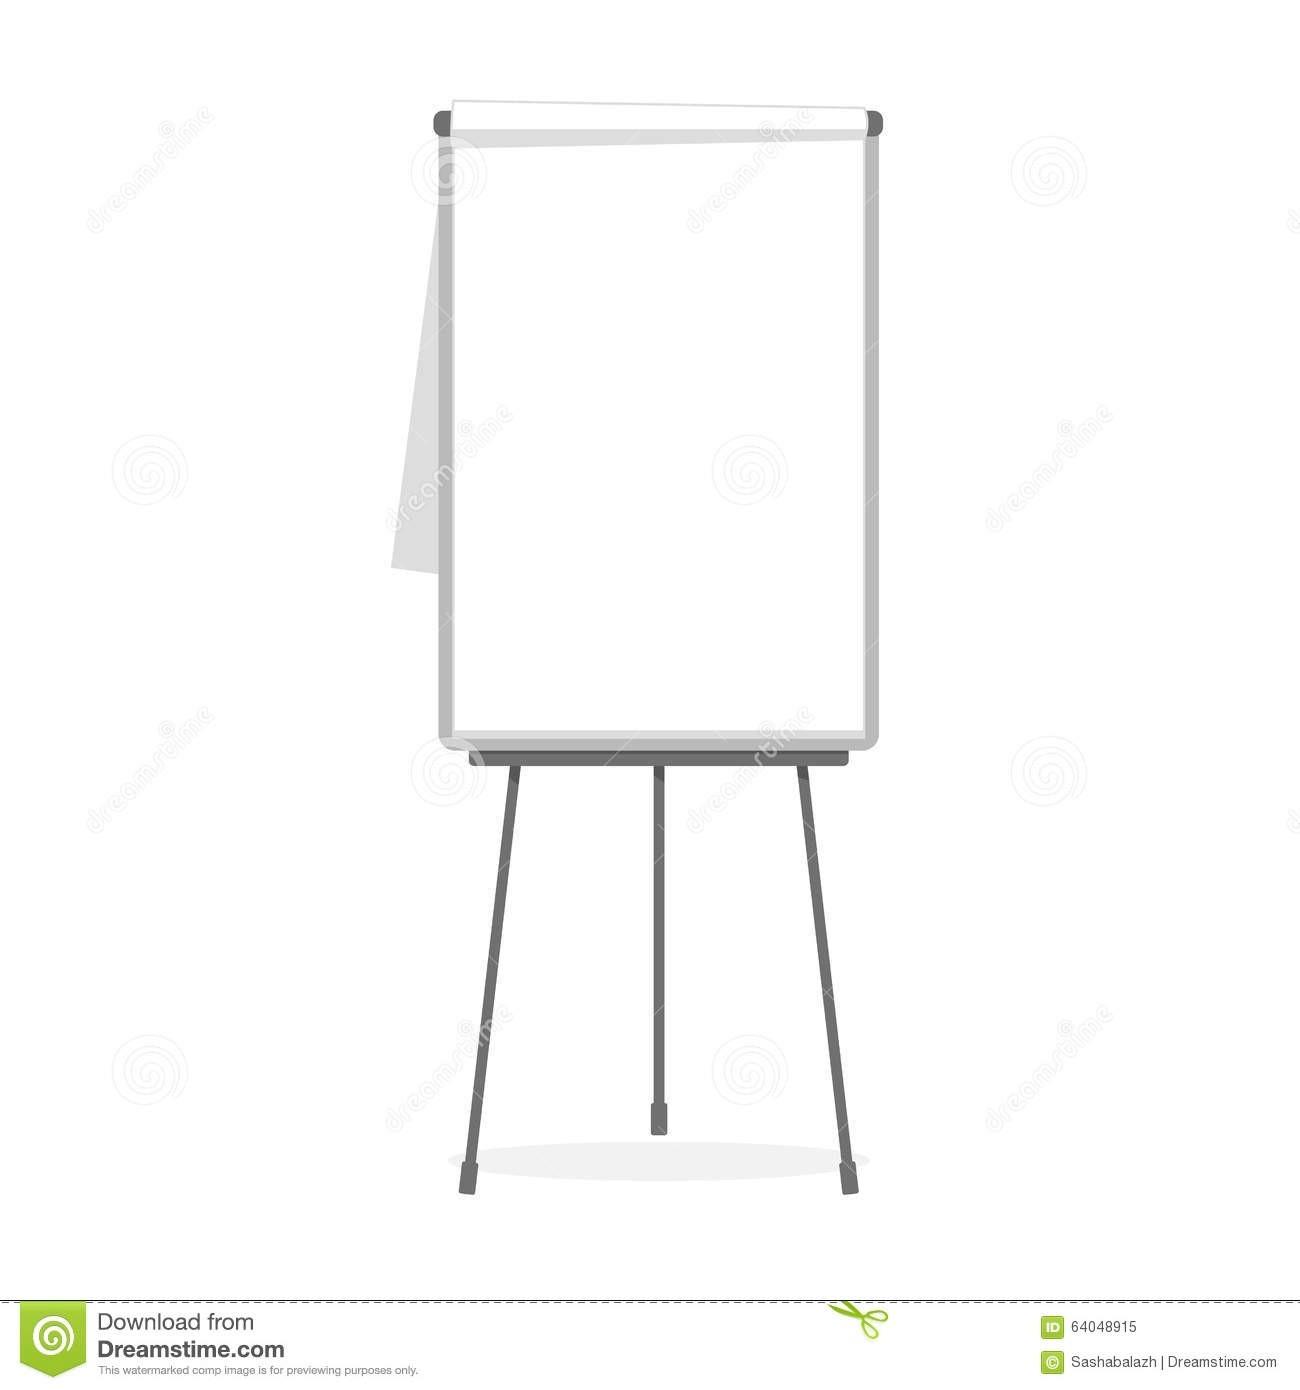 Flipchart Blank Template Illustration 64048915 - Megapixl  Flip Chart Template